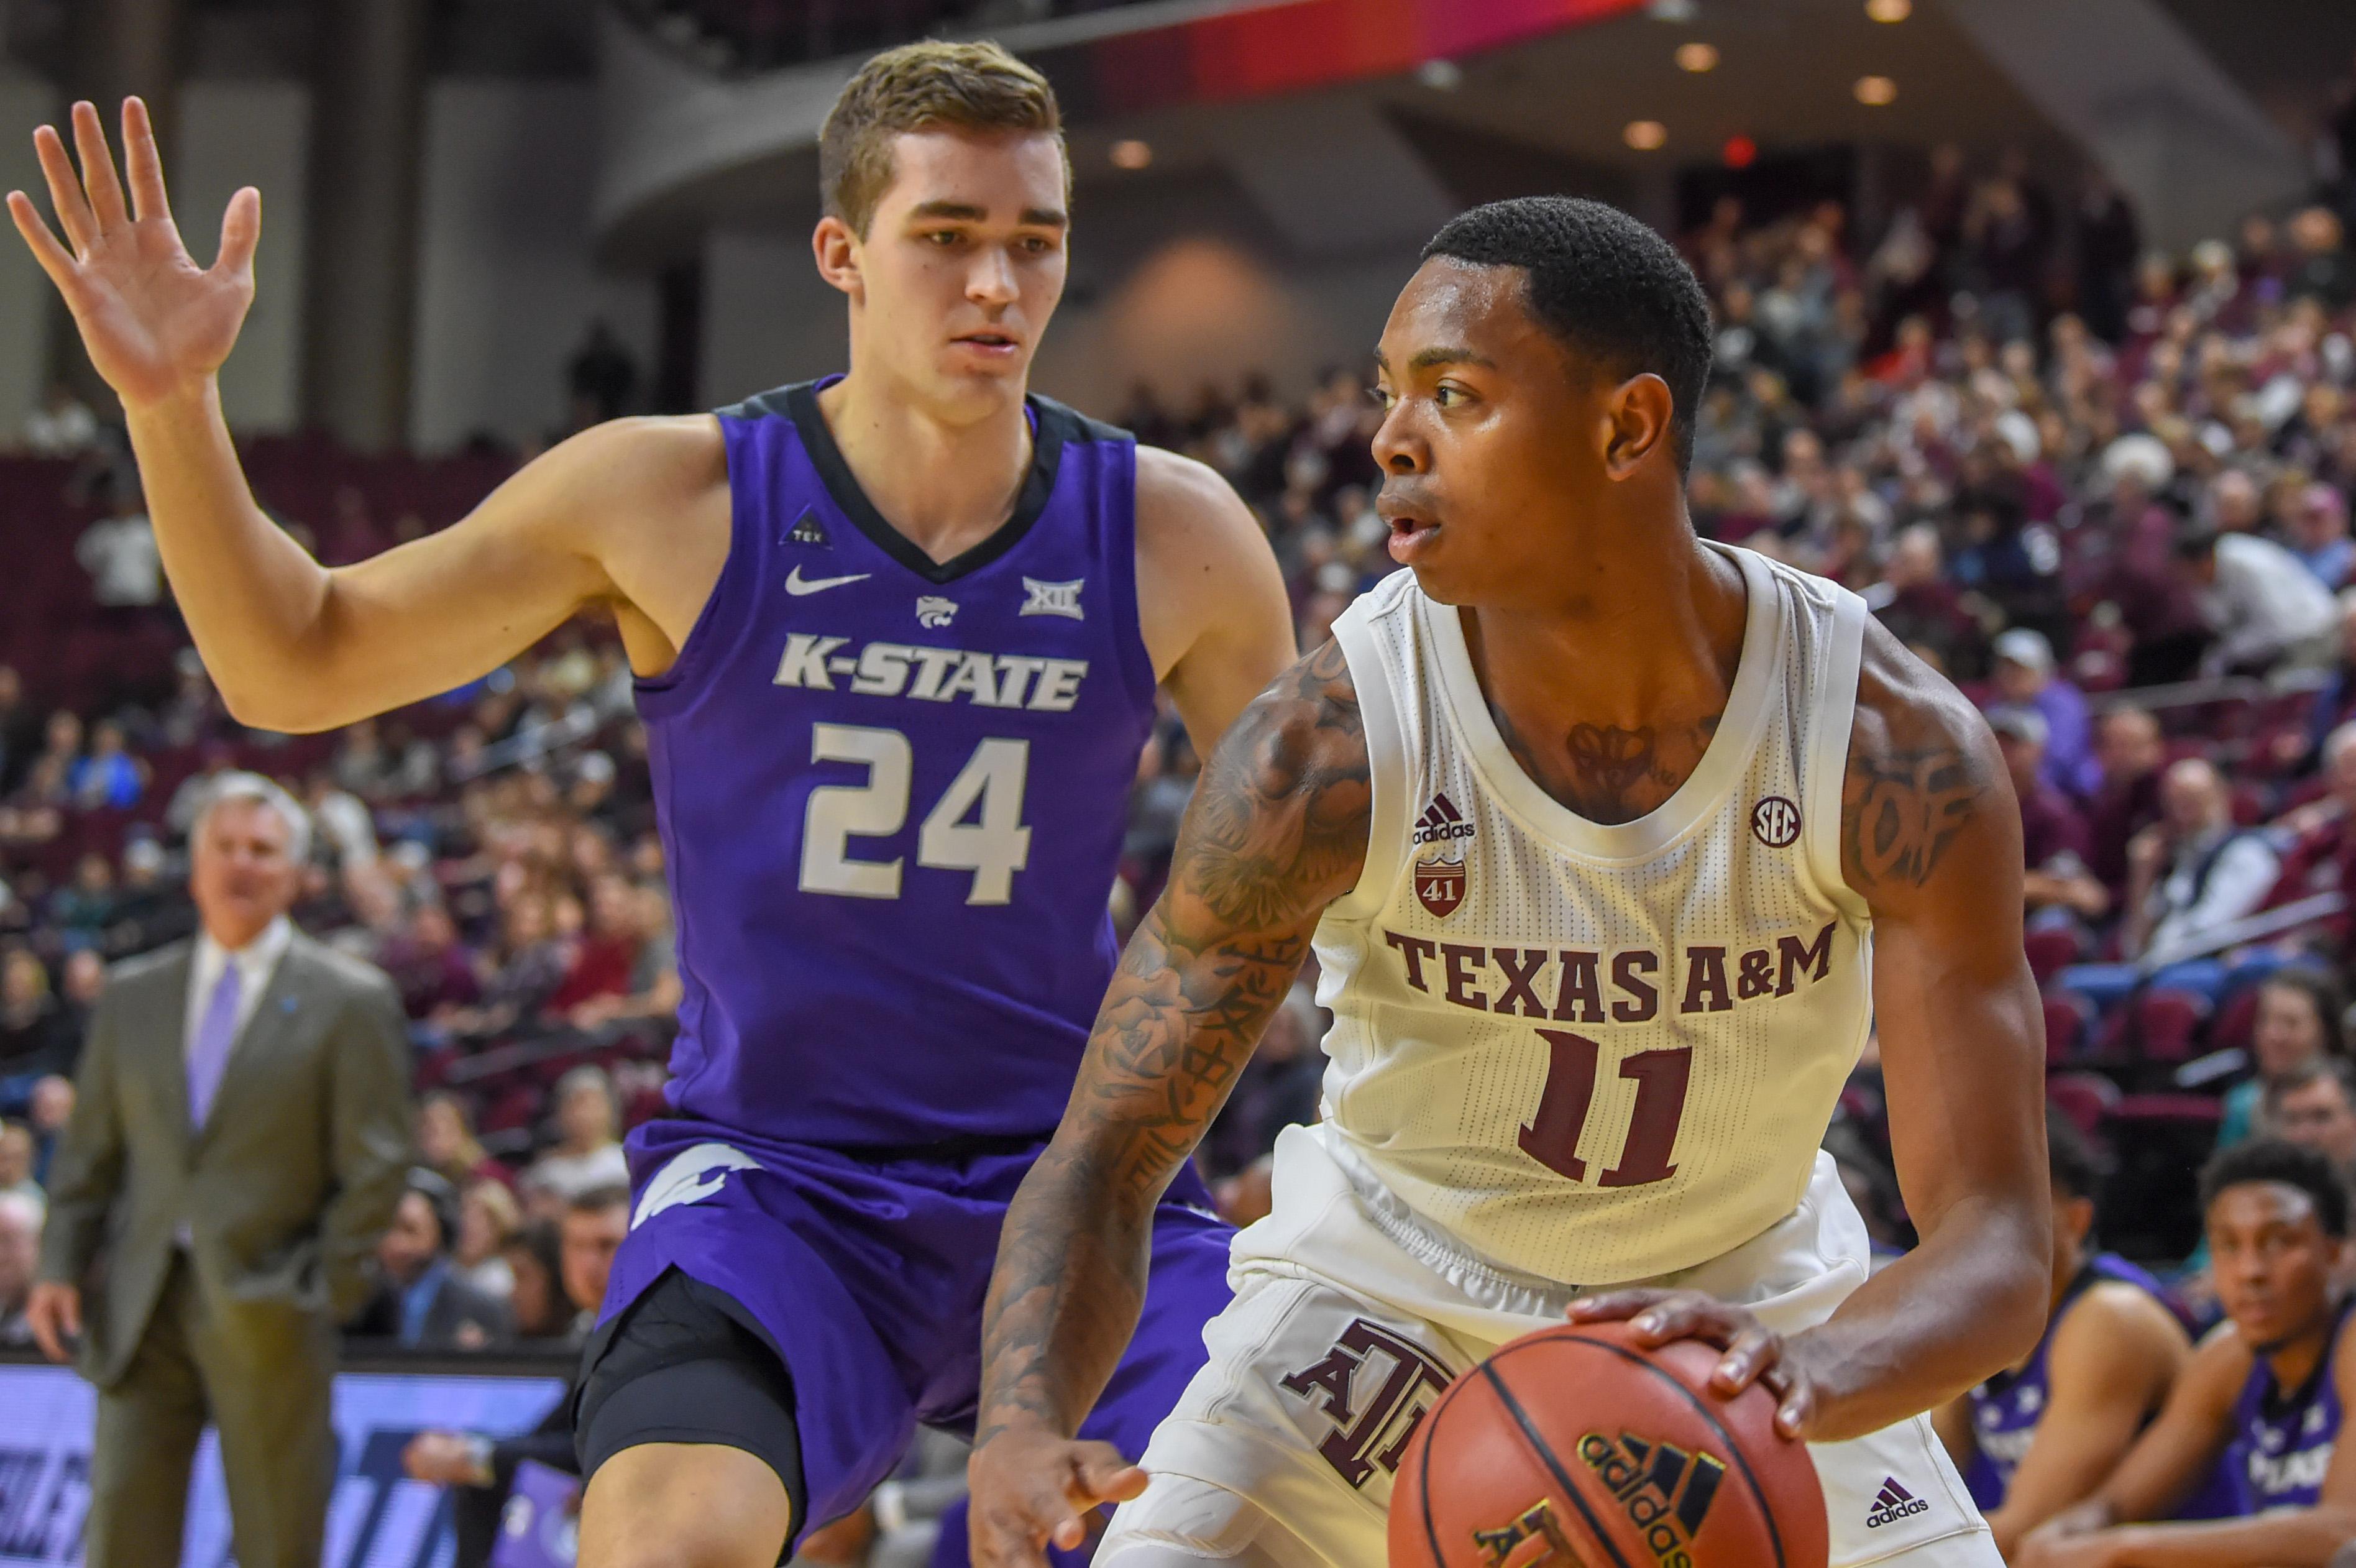 COLLEGE BASKETBALL: JAN 26 Kansas State at Texas A&M